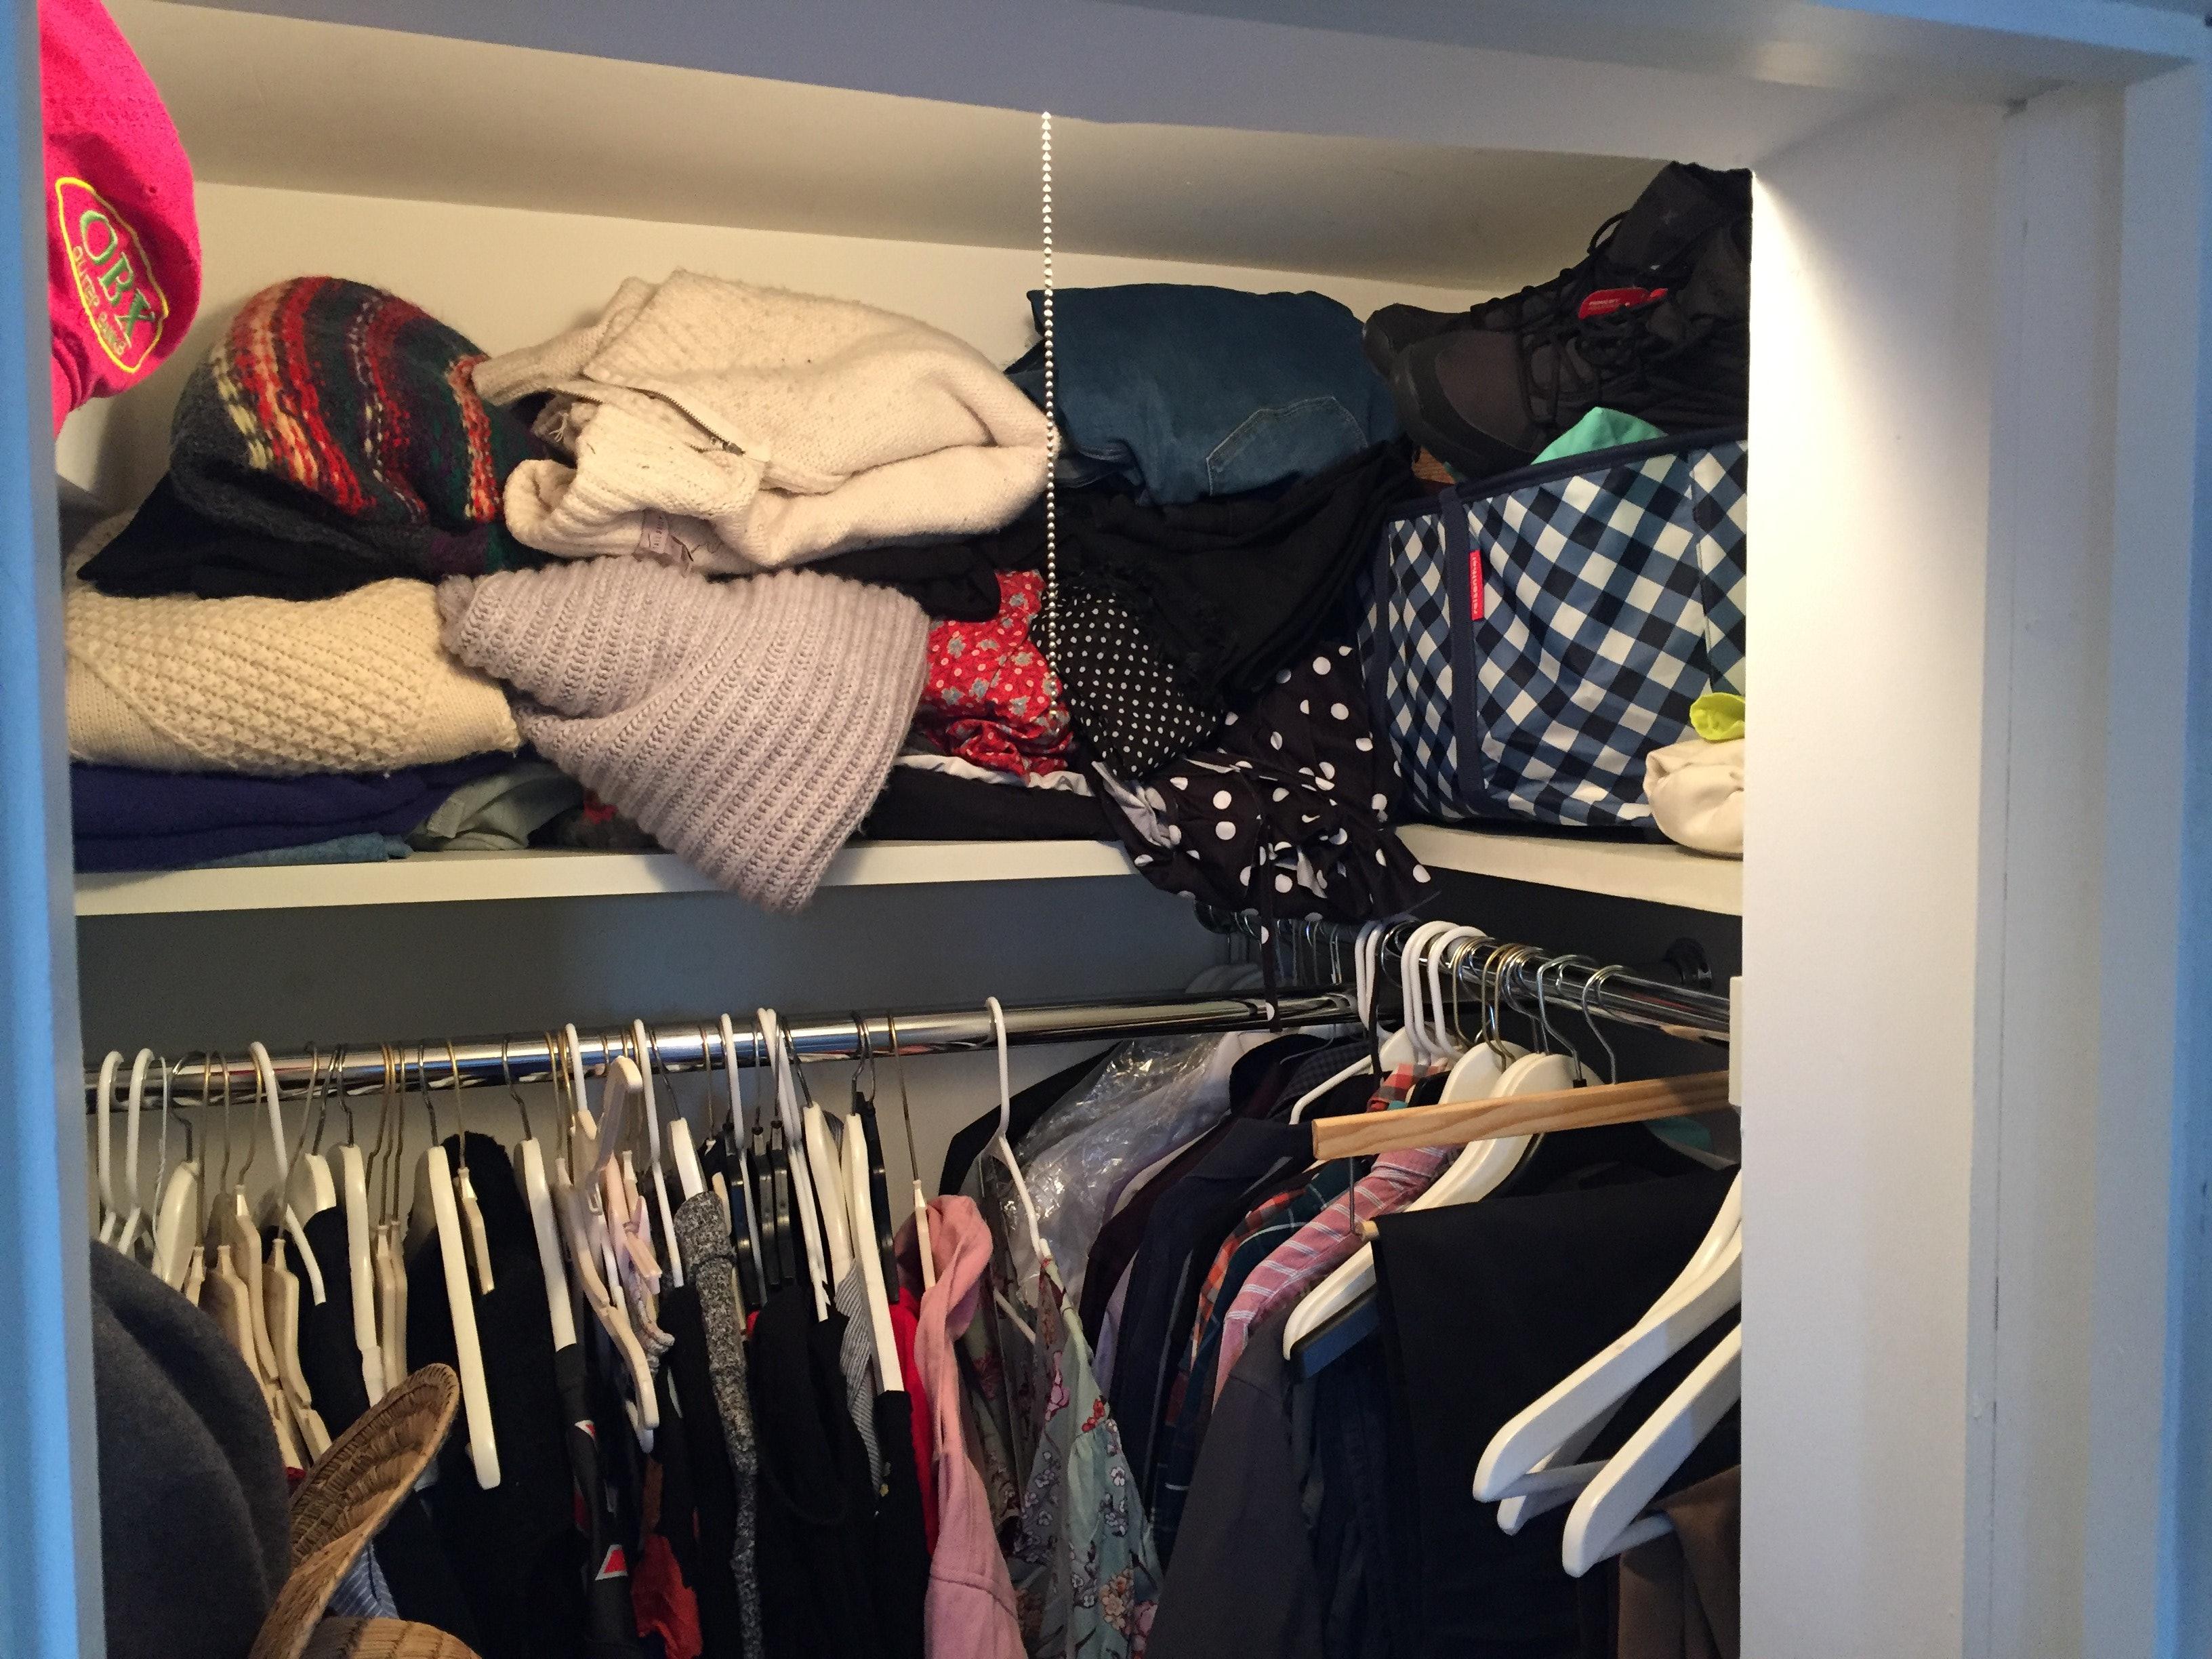 How To Organize A Small Closet According To A Professional Organizer